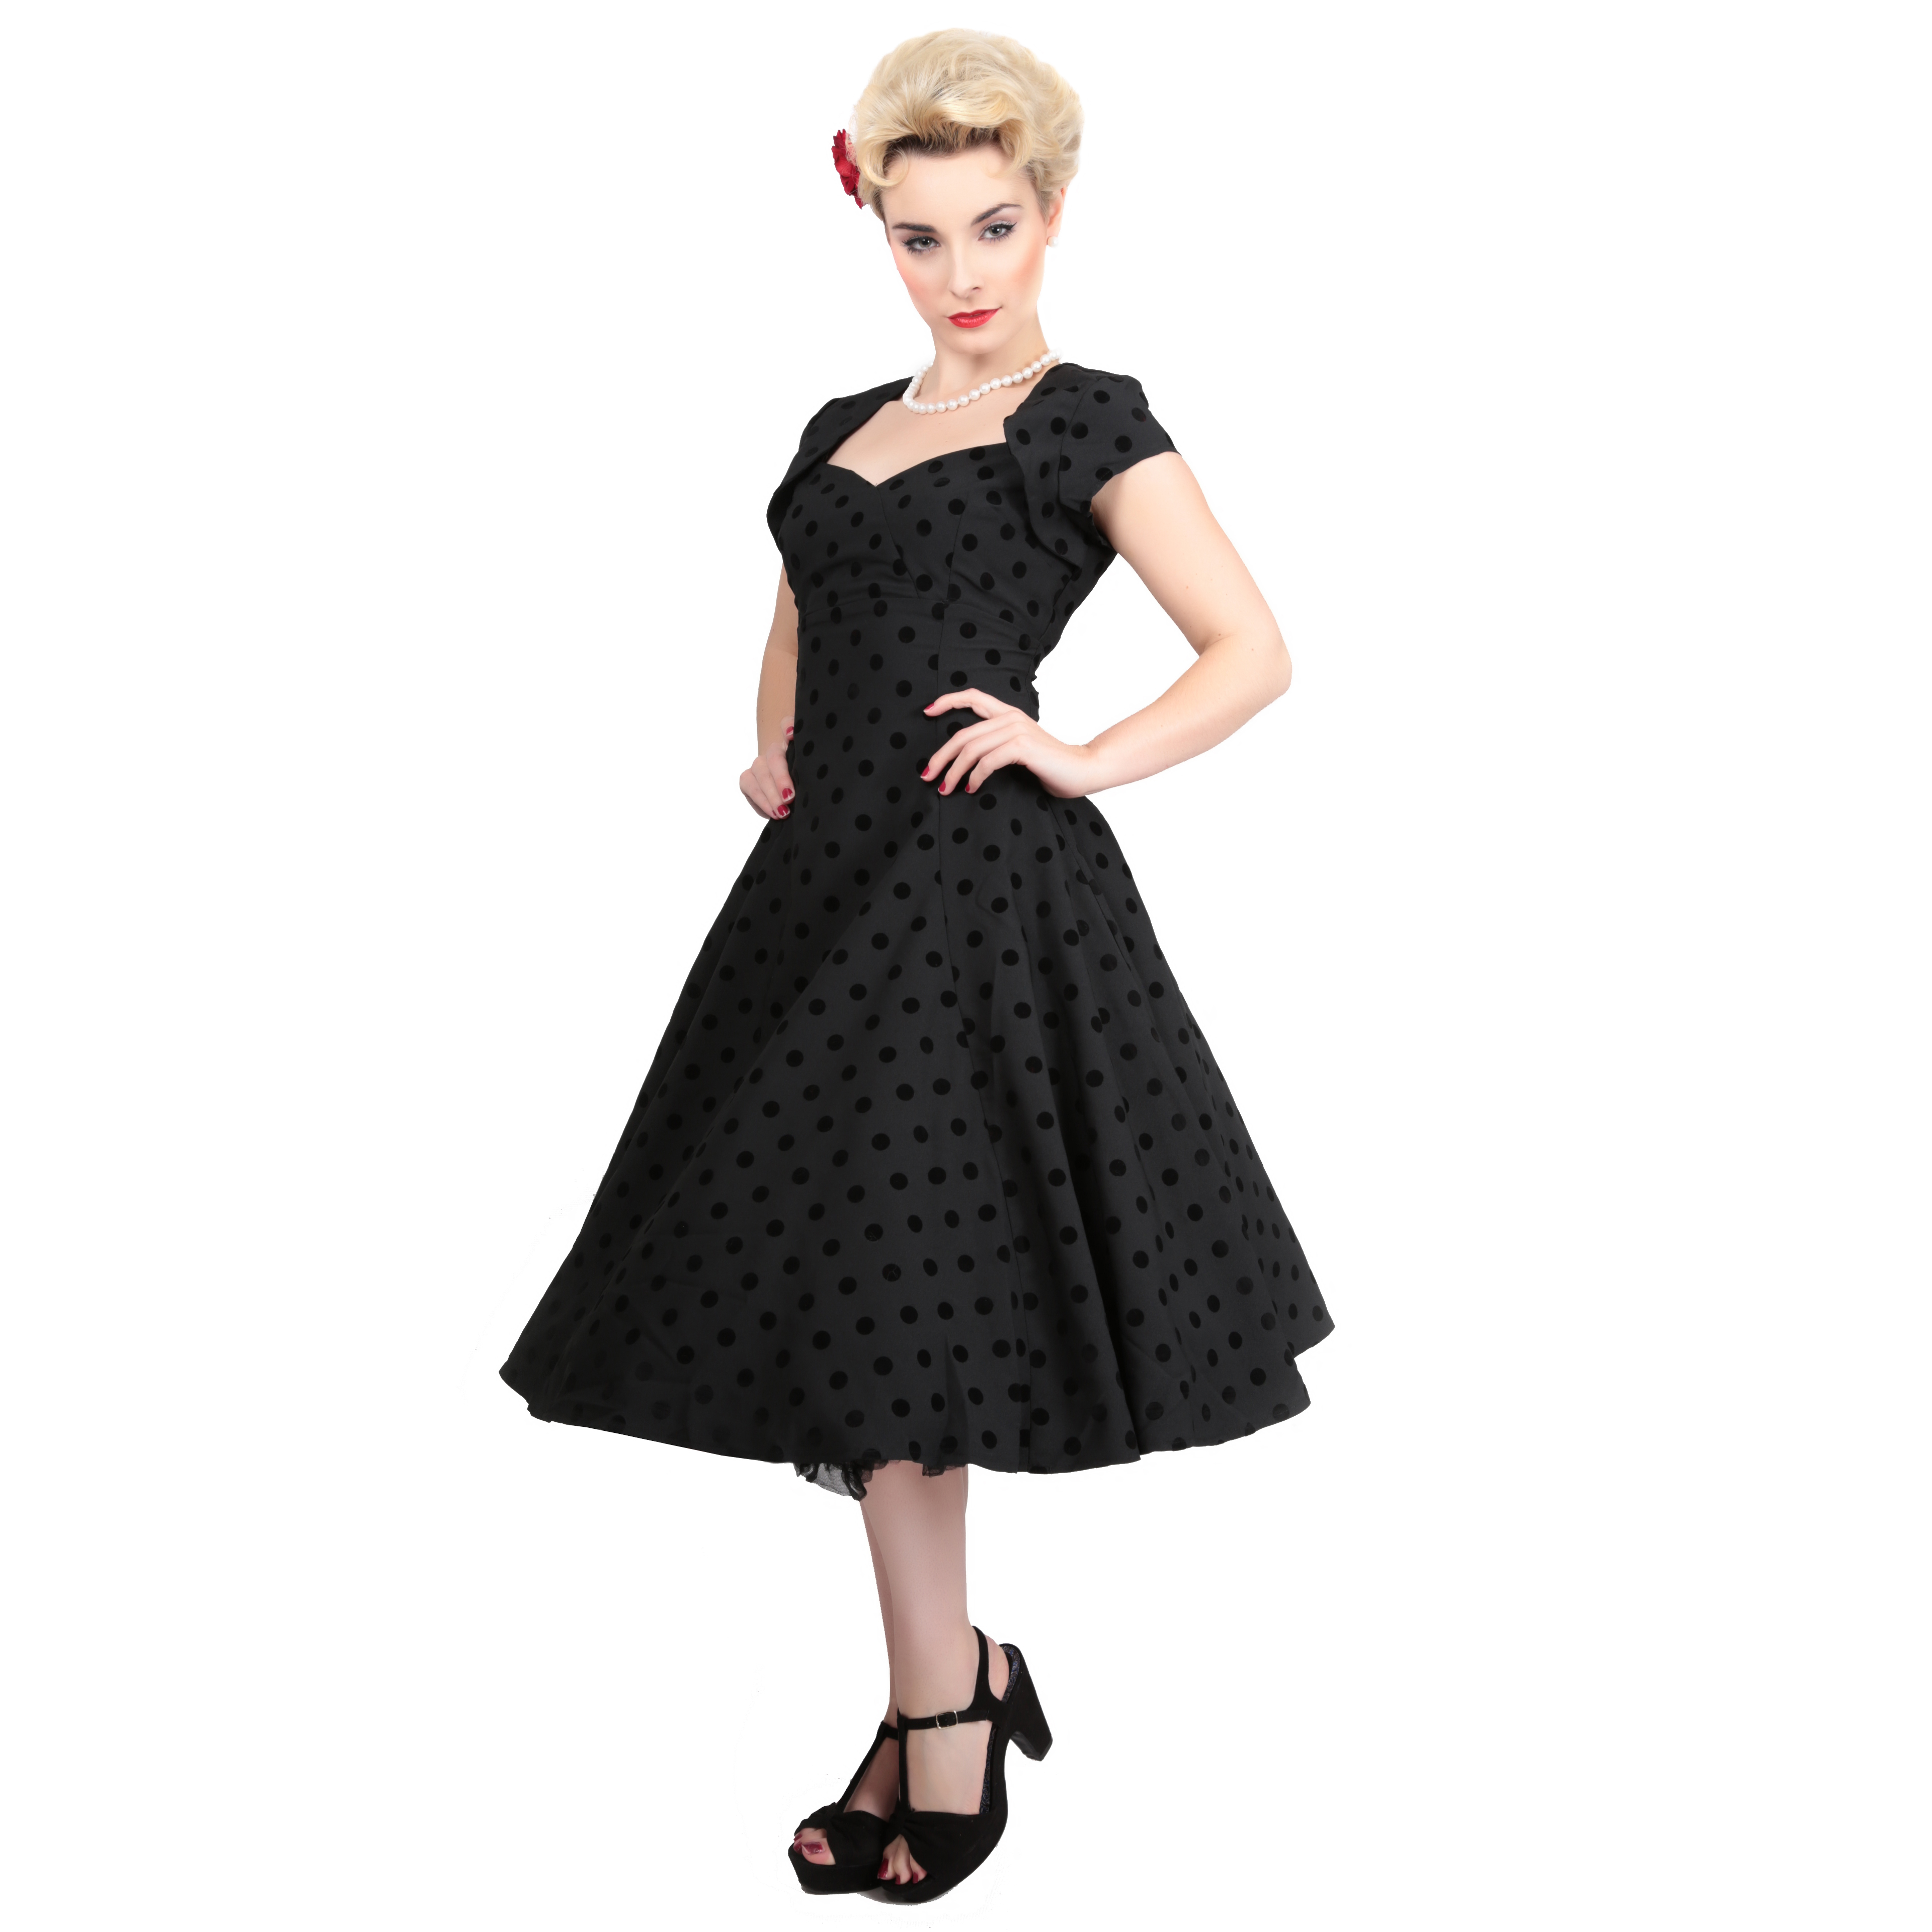 Collectif Regina Doll Black Flock Dot Vintage 1950s Retro Style ...